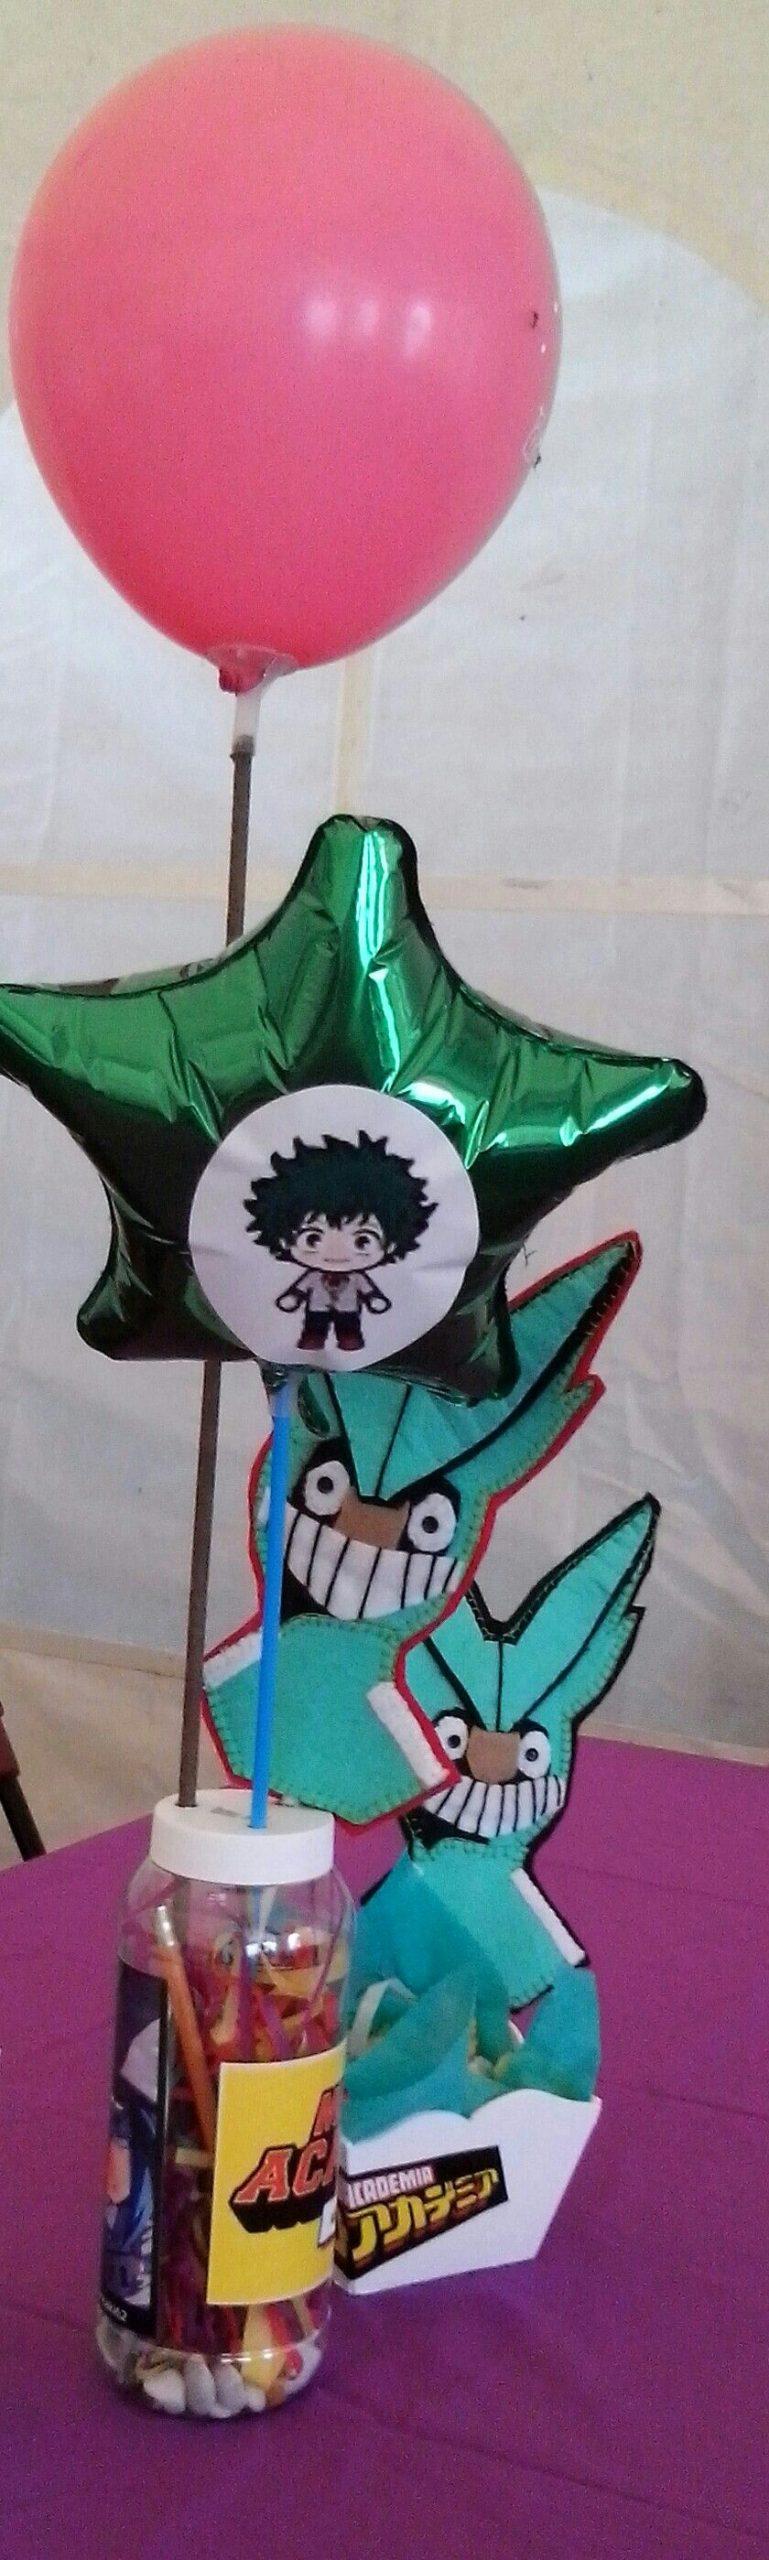 Park Art My WordPress Blog_My Hero Academia Birthday Party Supplies